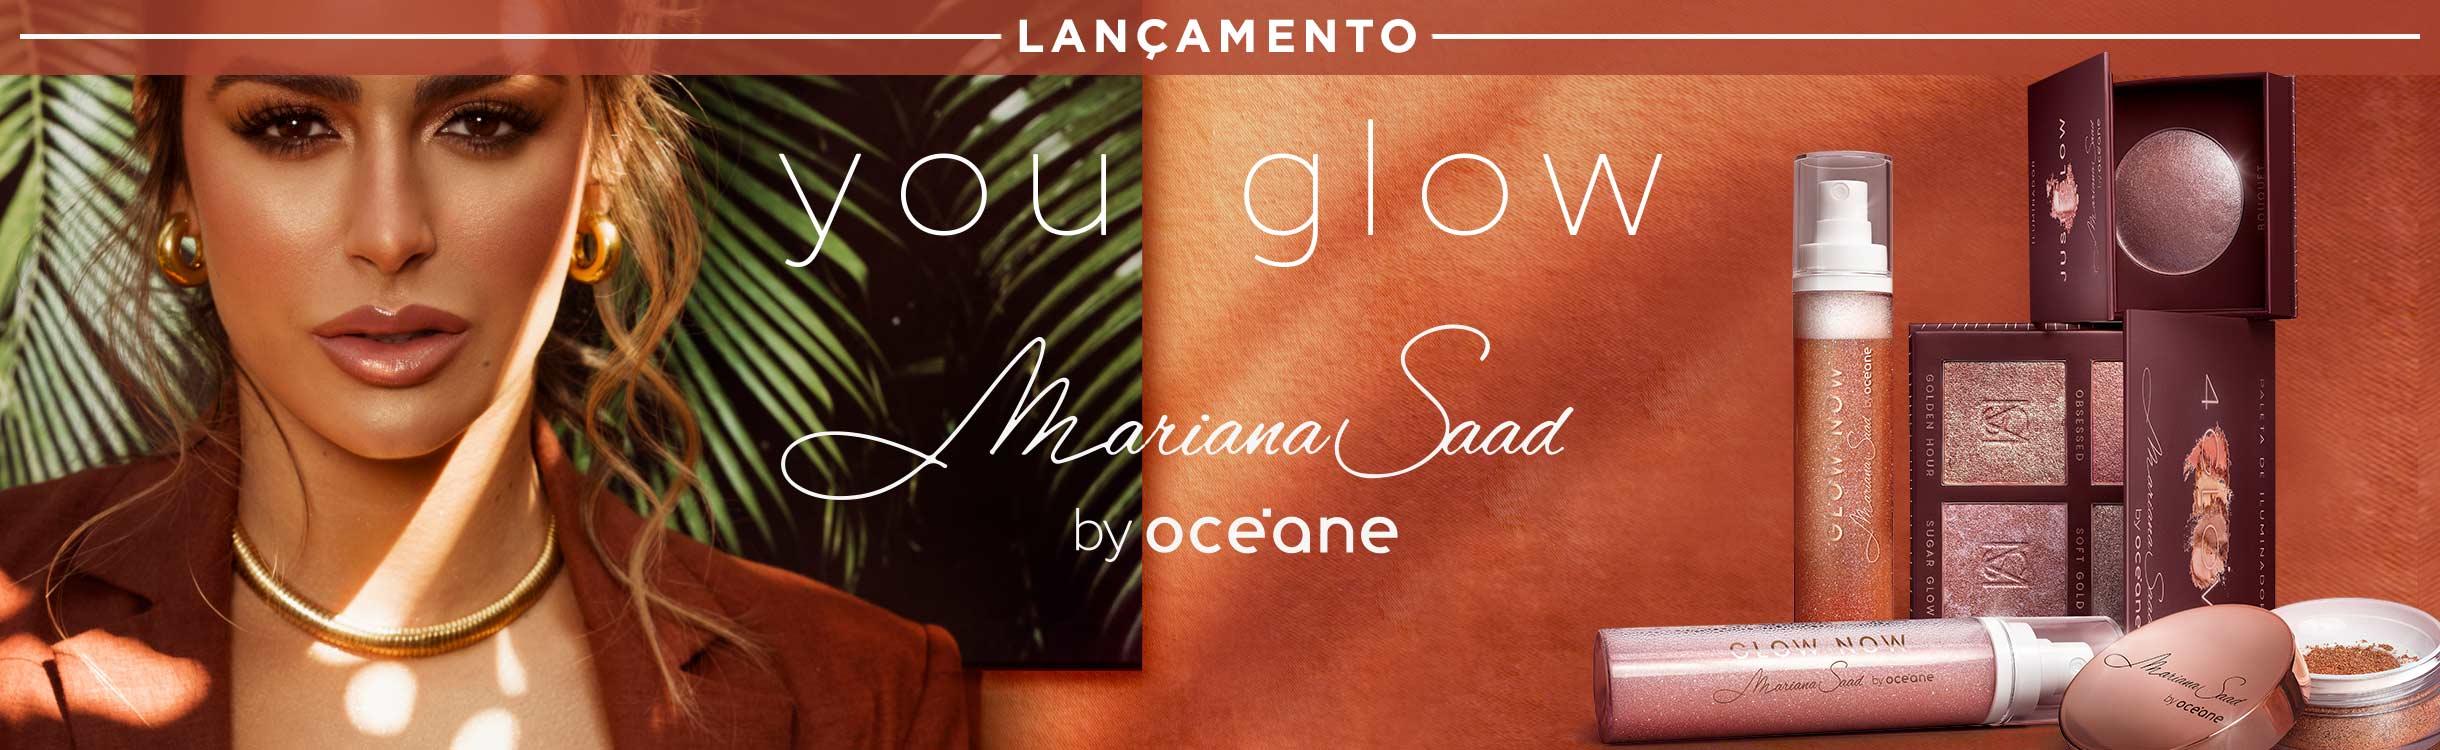 Oceane | You Glow Mariana Saad